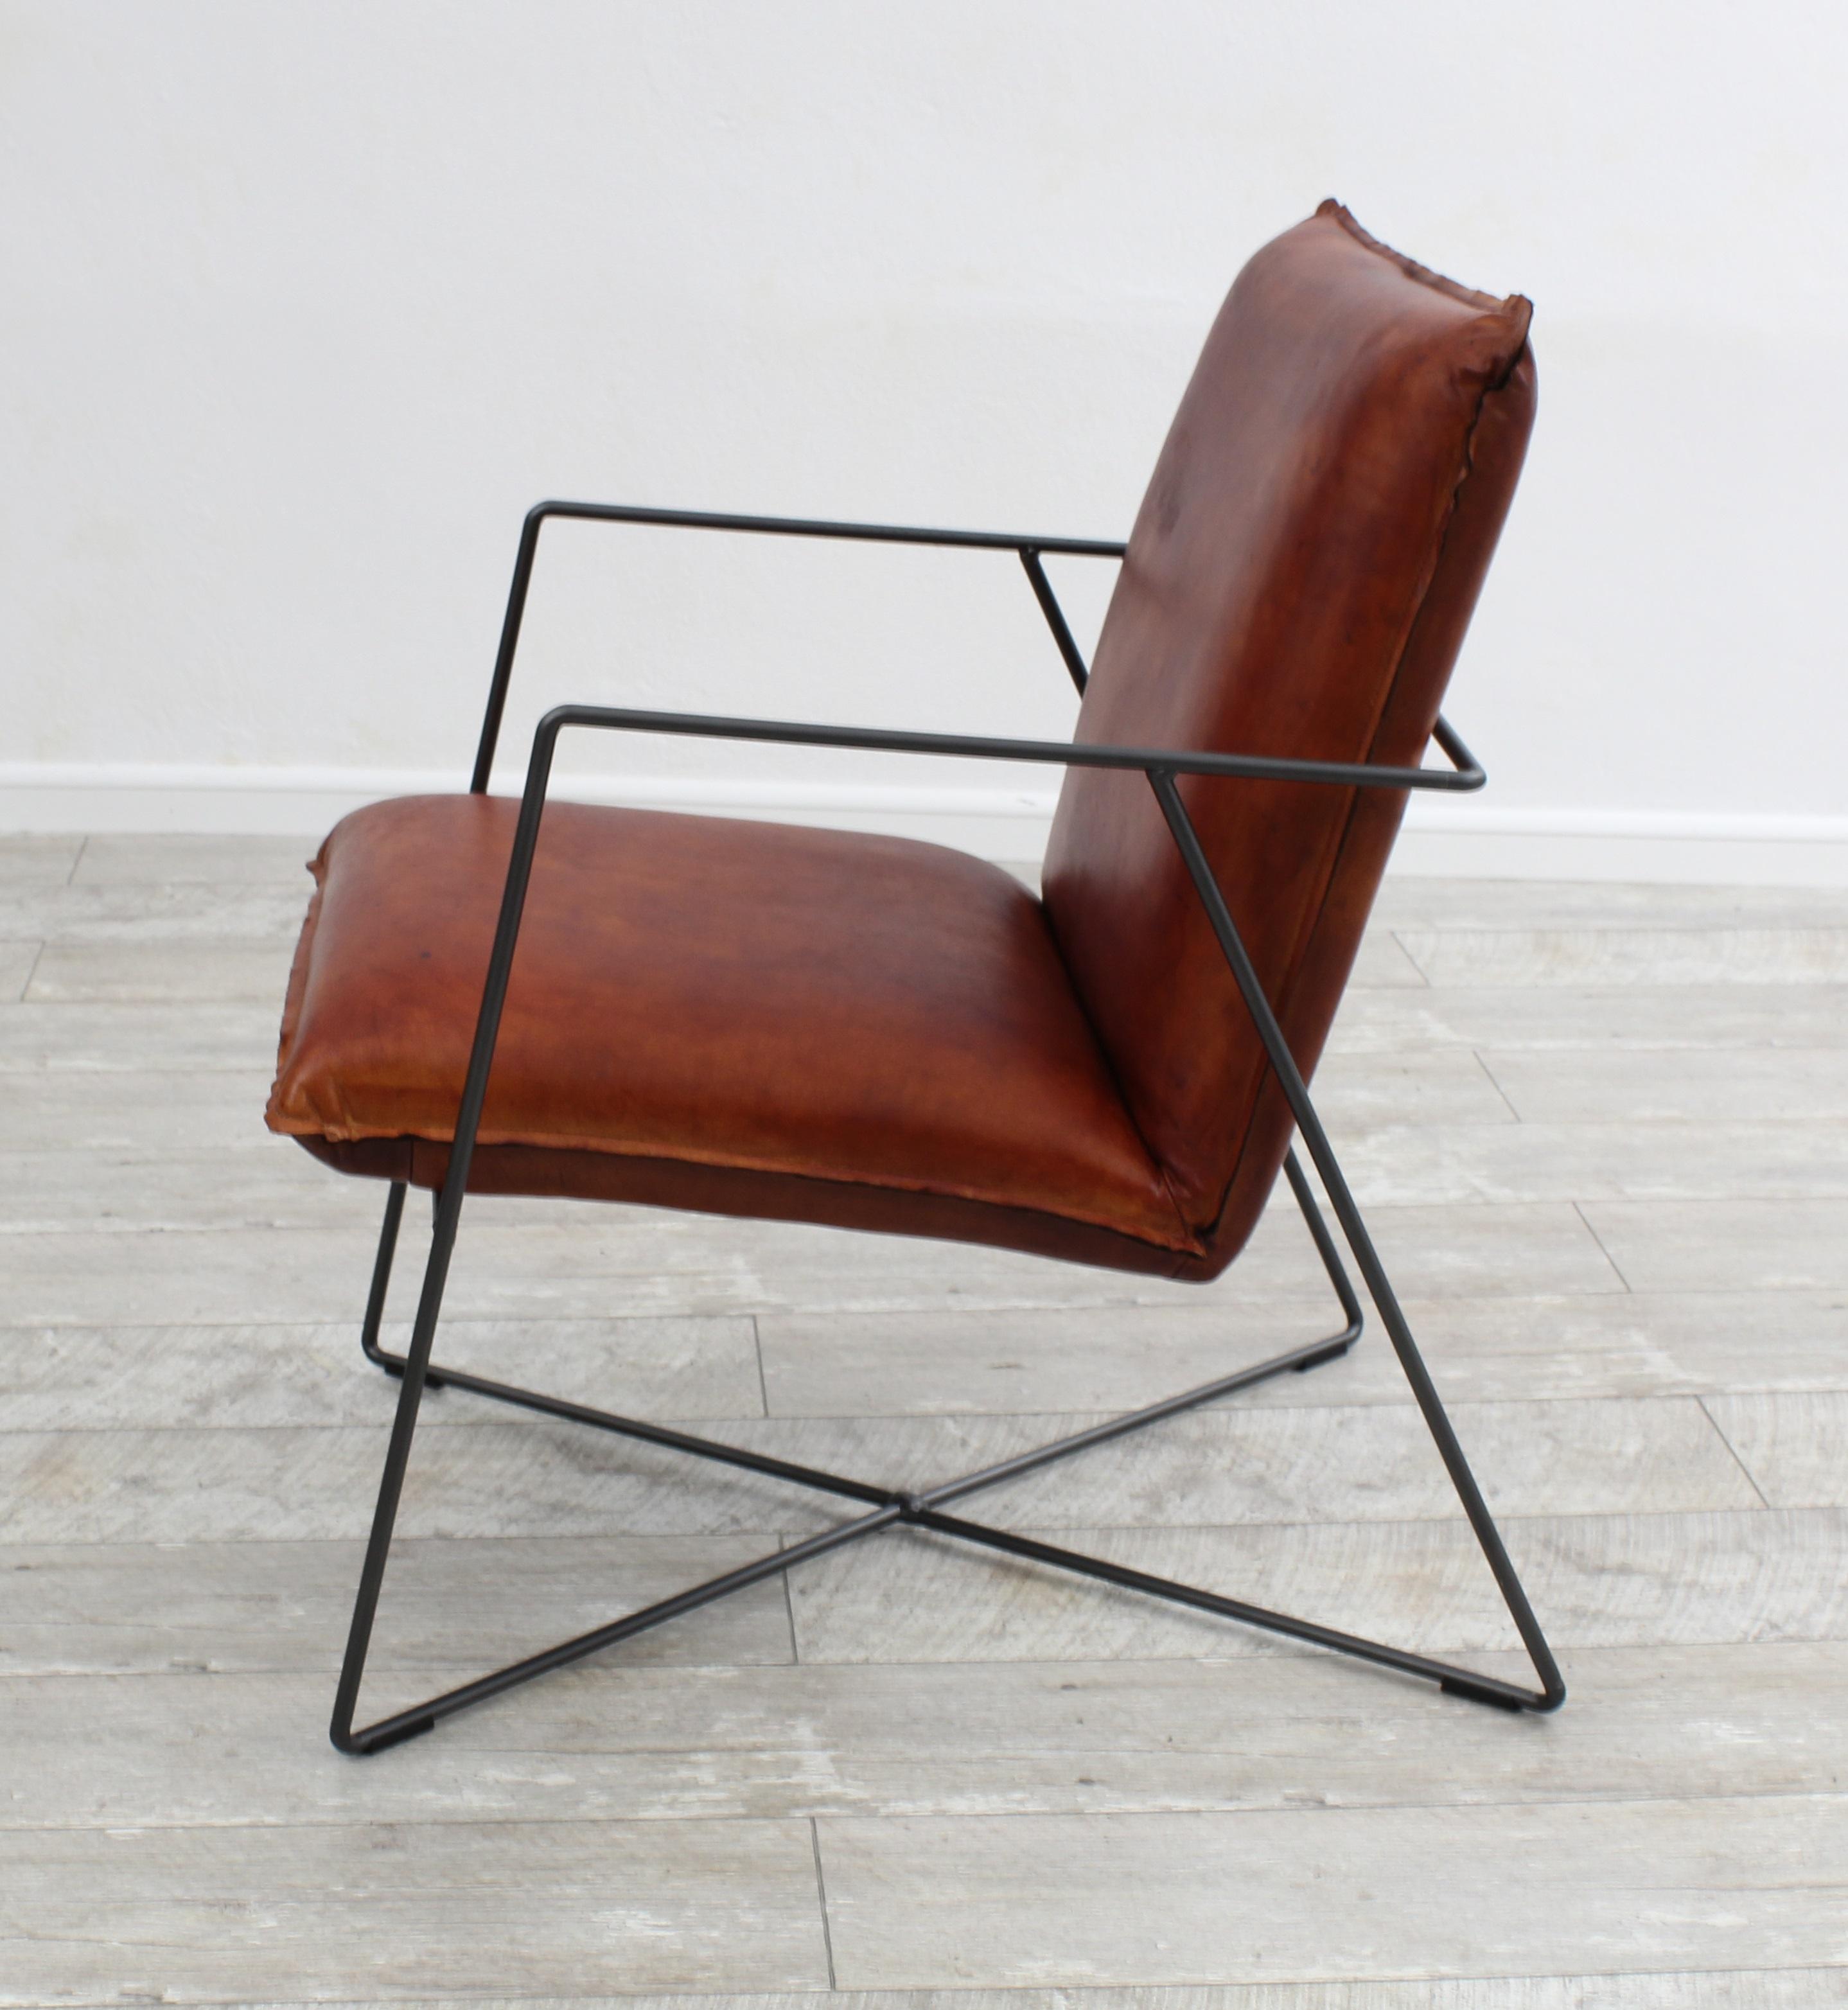 Aktiv Moebel De Sessel Stuhl Designer Koln Echt Buffel